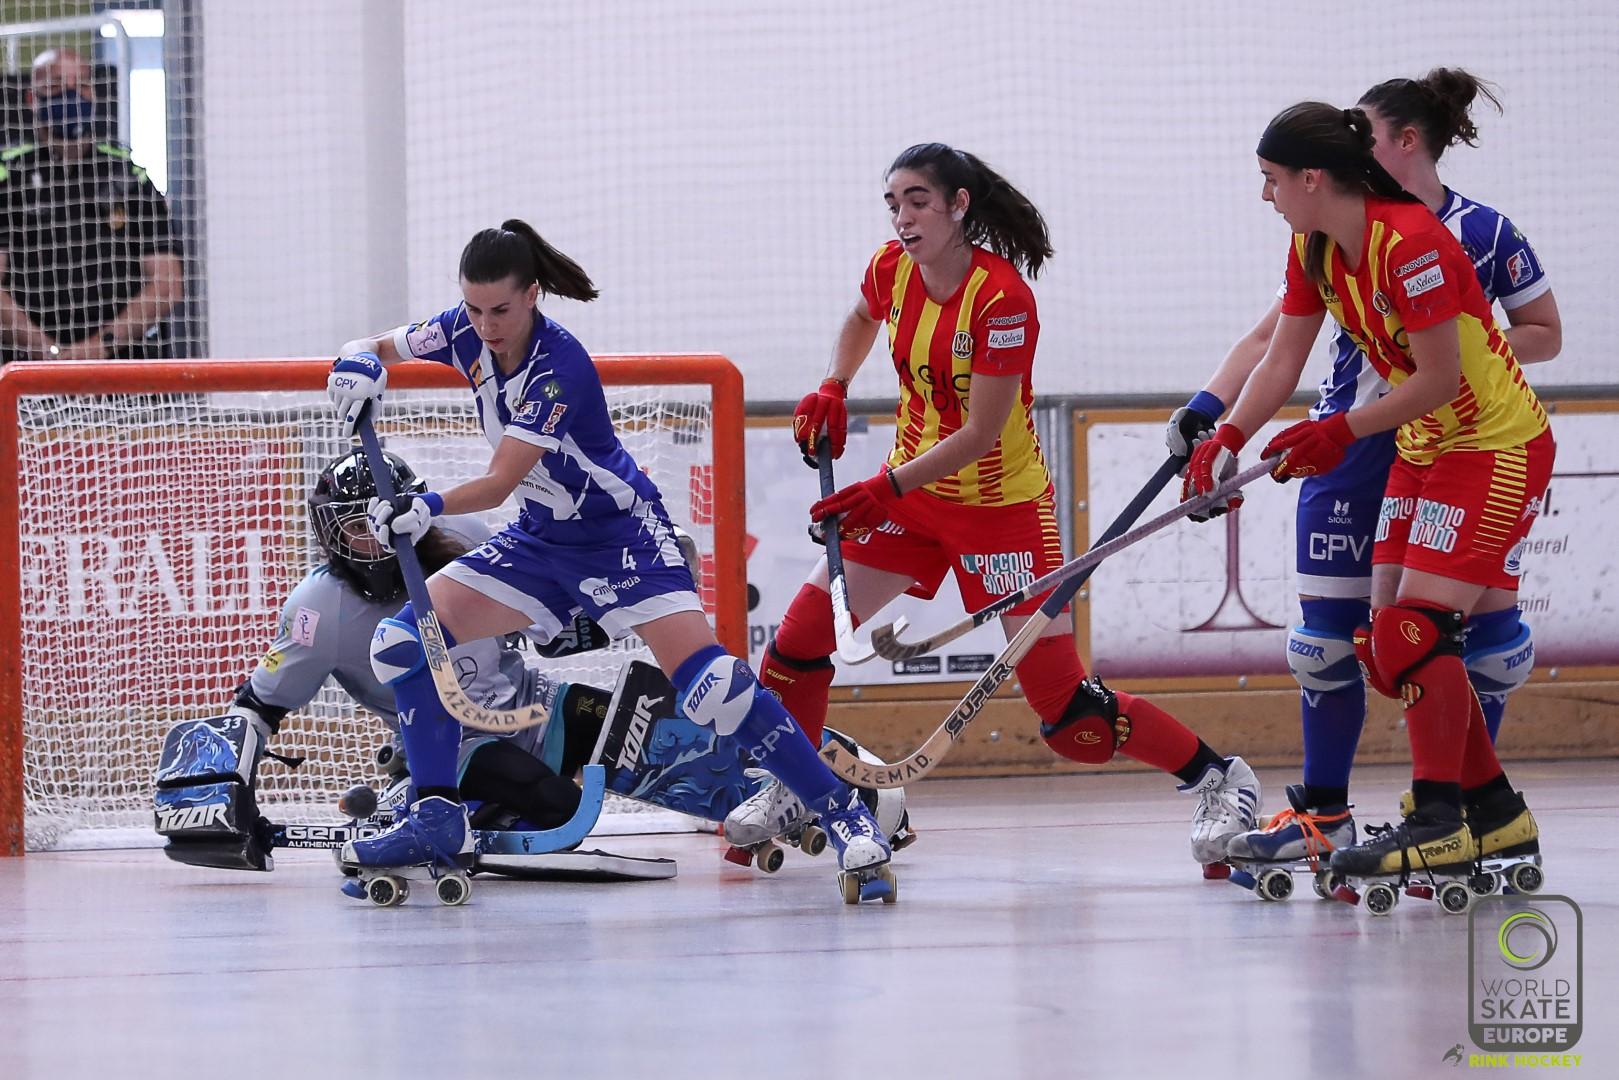 PHOTOS - 29-05-2021 - FEMALE LEAGUE CUP- Match #018 - CP Voltregà (SP) x CP Manlleu (SP)